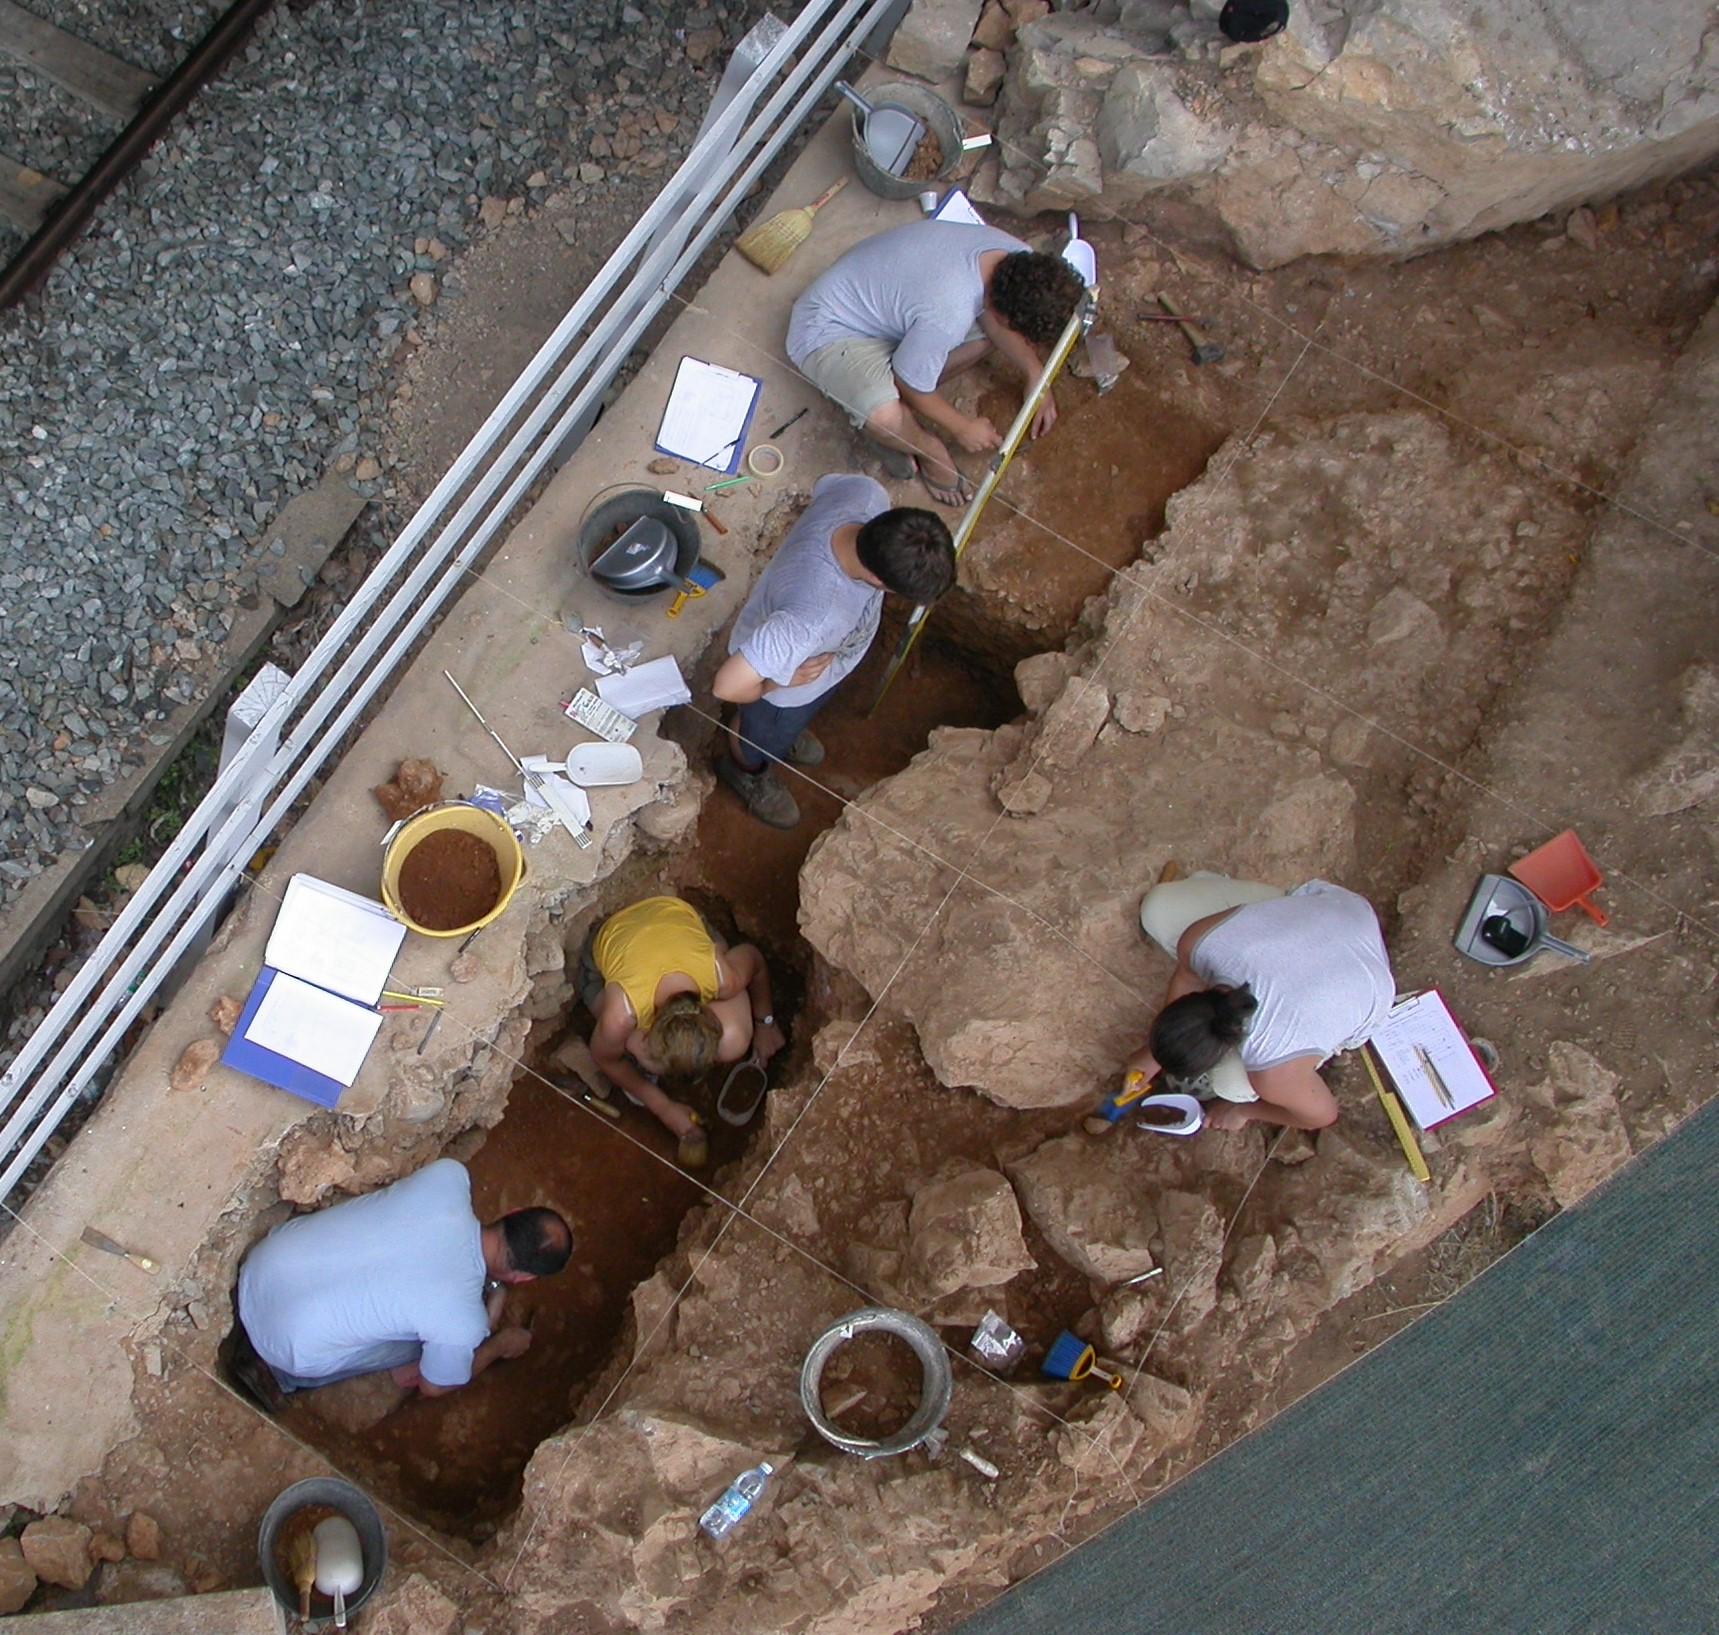 Archeologists are shown excavating Neanderthal levels at Riparo Bombrini, Northwest Italy. Credit: Fabio Negrino